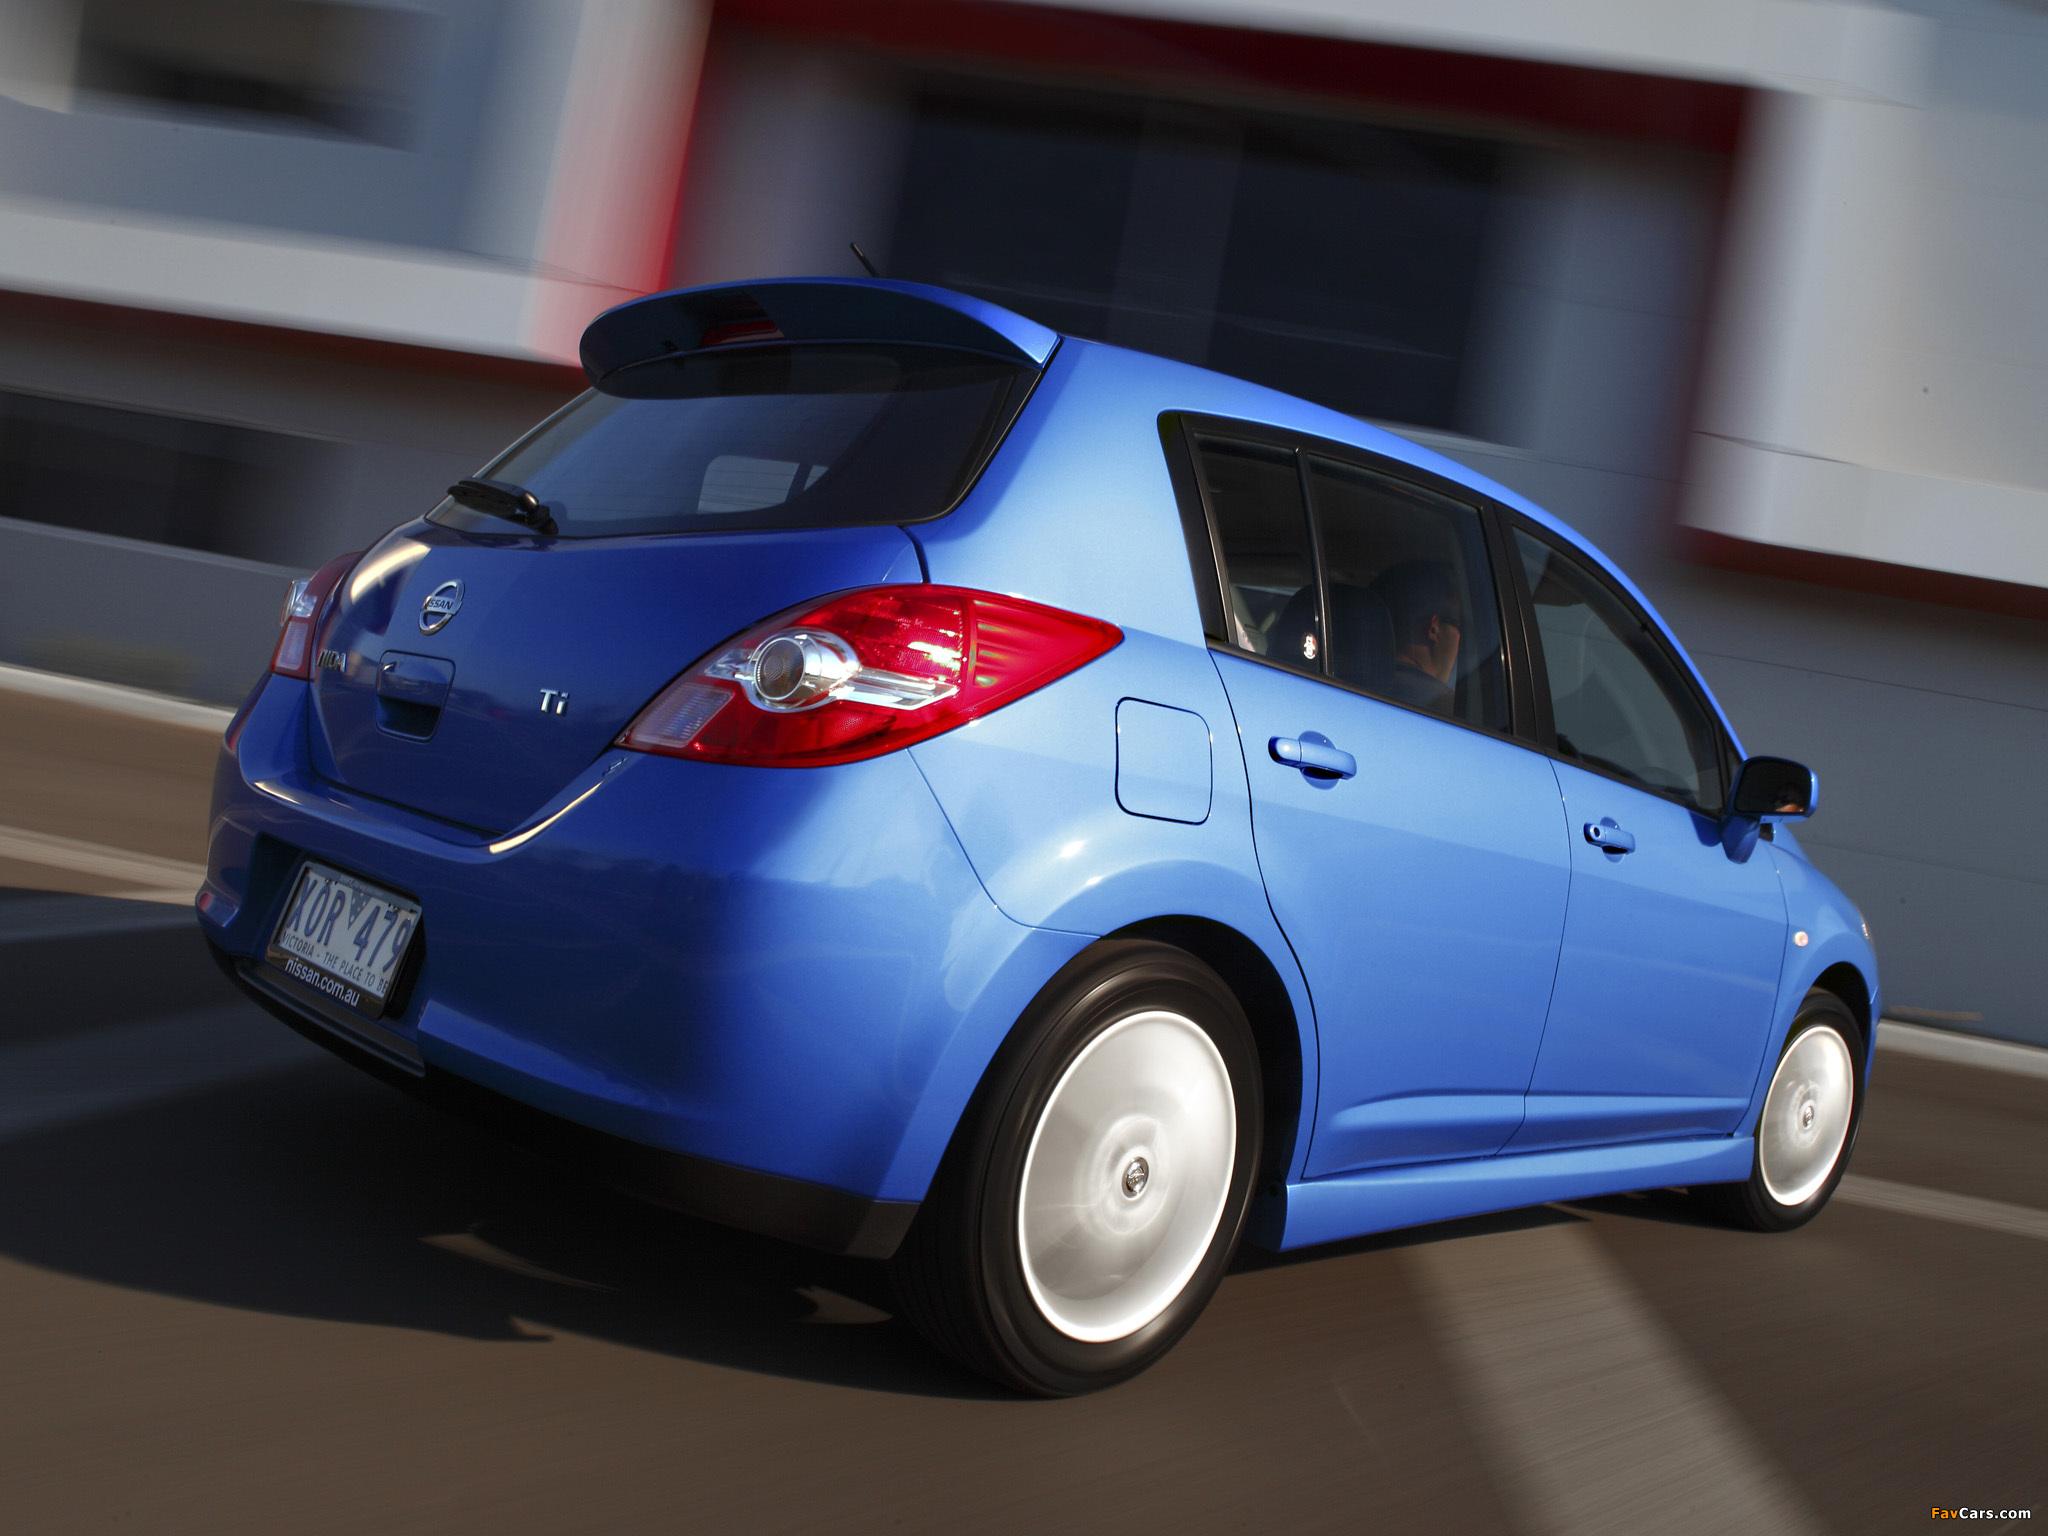 Nissan Tiida Hatchback AU-spec (C11) 2010 photos (2048 x 1536)